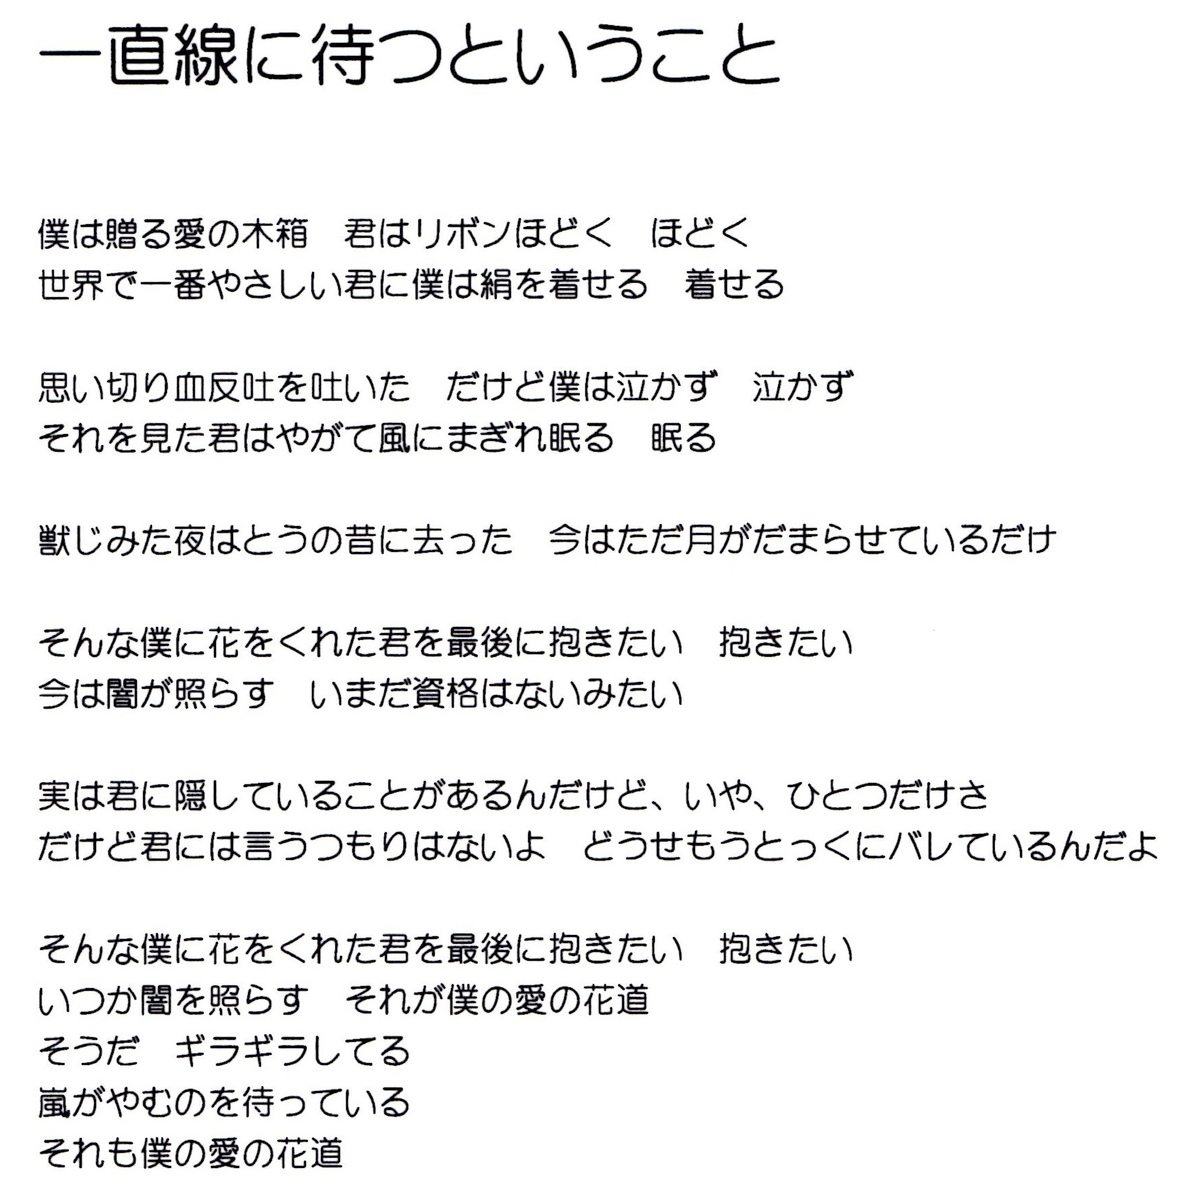 f:id:hamasansu:20200818105600j:plain